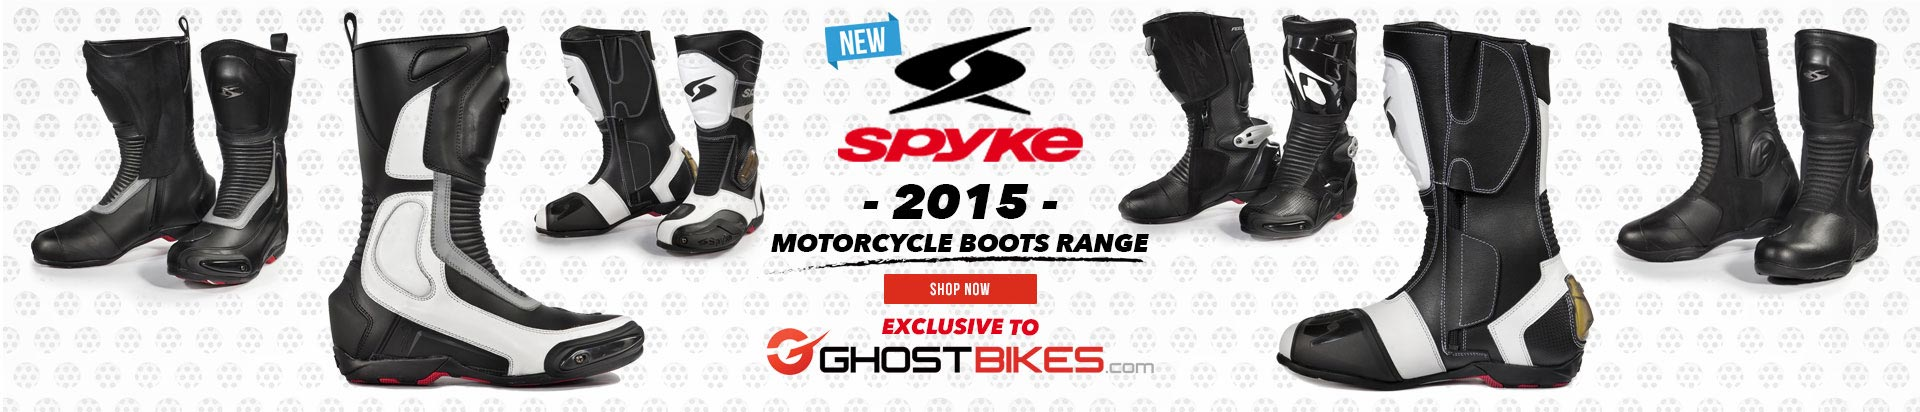 Spyke Boots